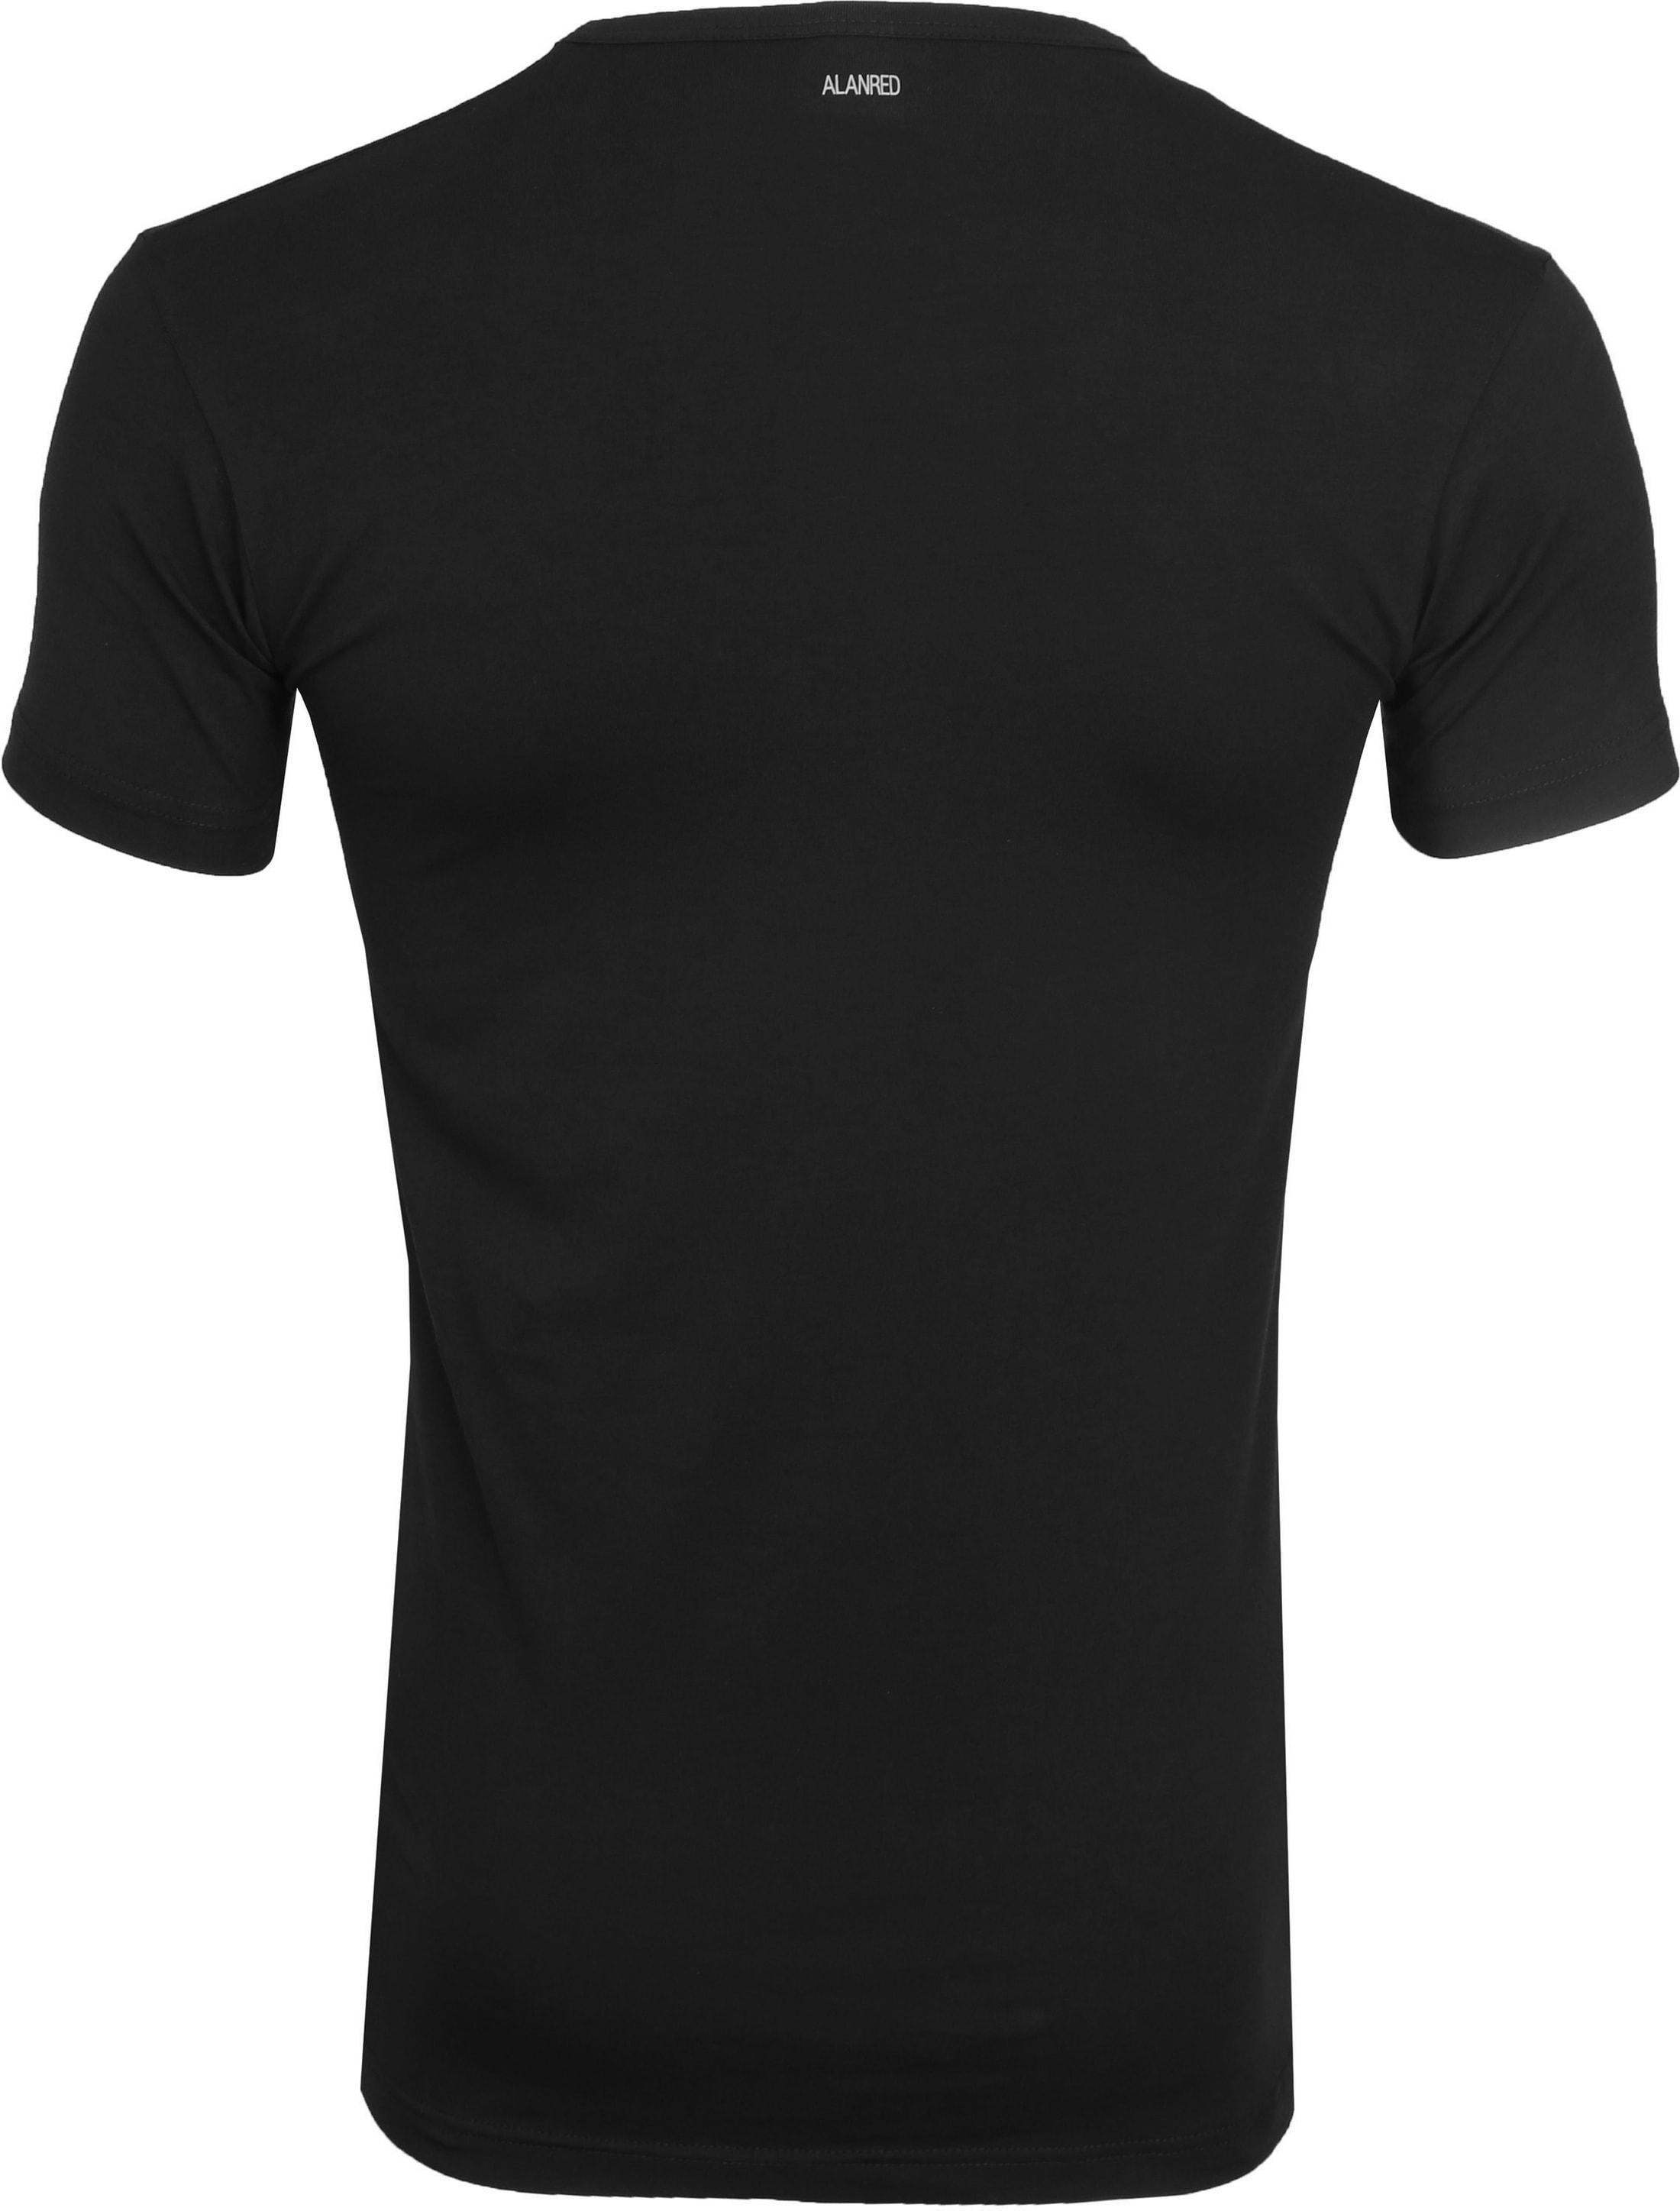 Alan Red Oklahoma T-Shirt Stretch Zwart (2-Pack) foto 4